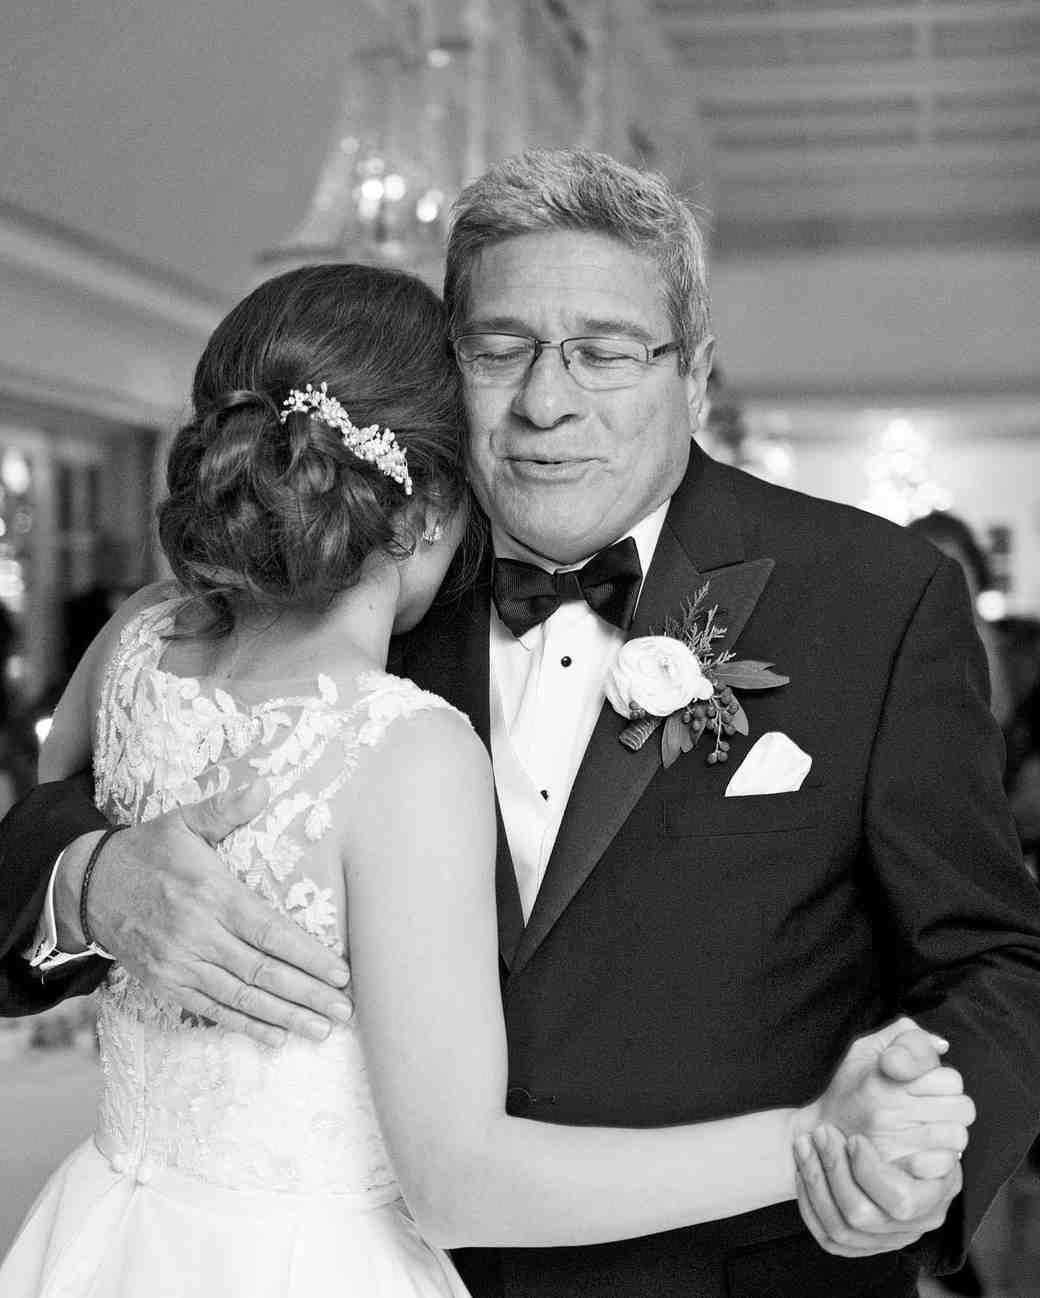 Martha Stewart Daughter Wedding.A Christmas Themed Wedding In Washington D C Real